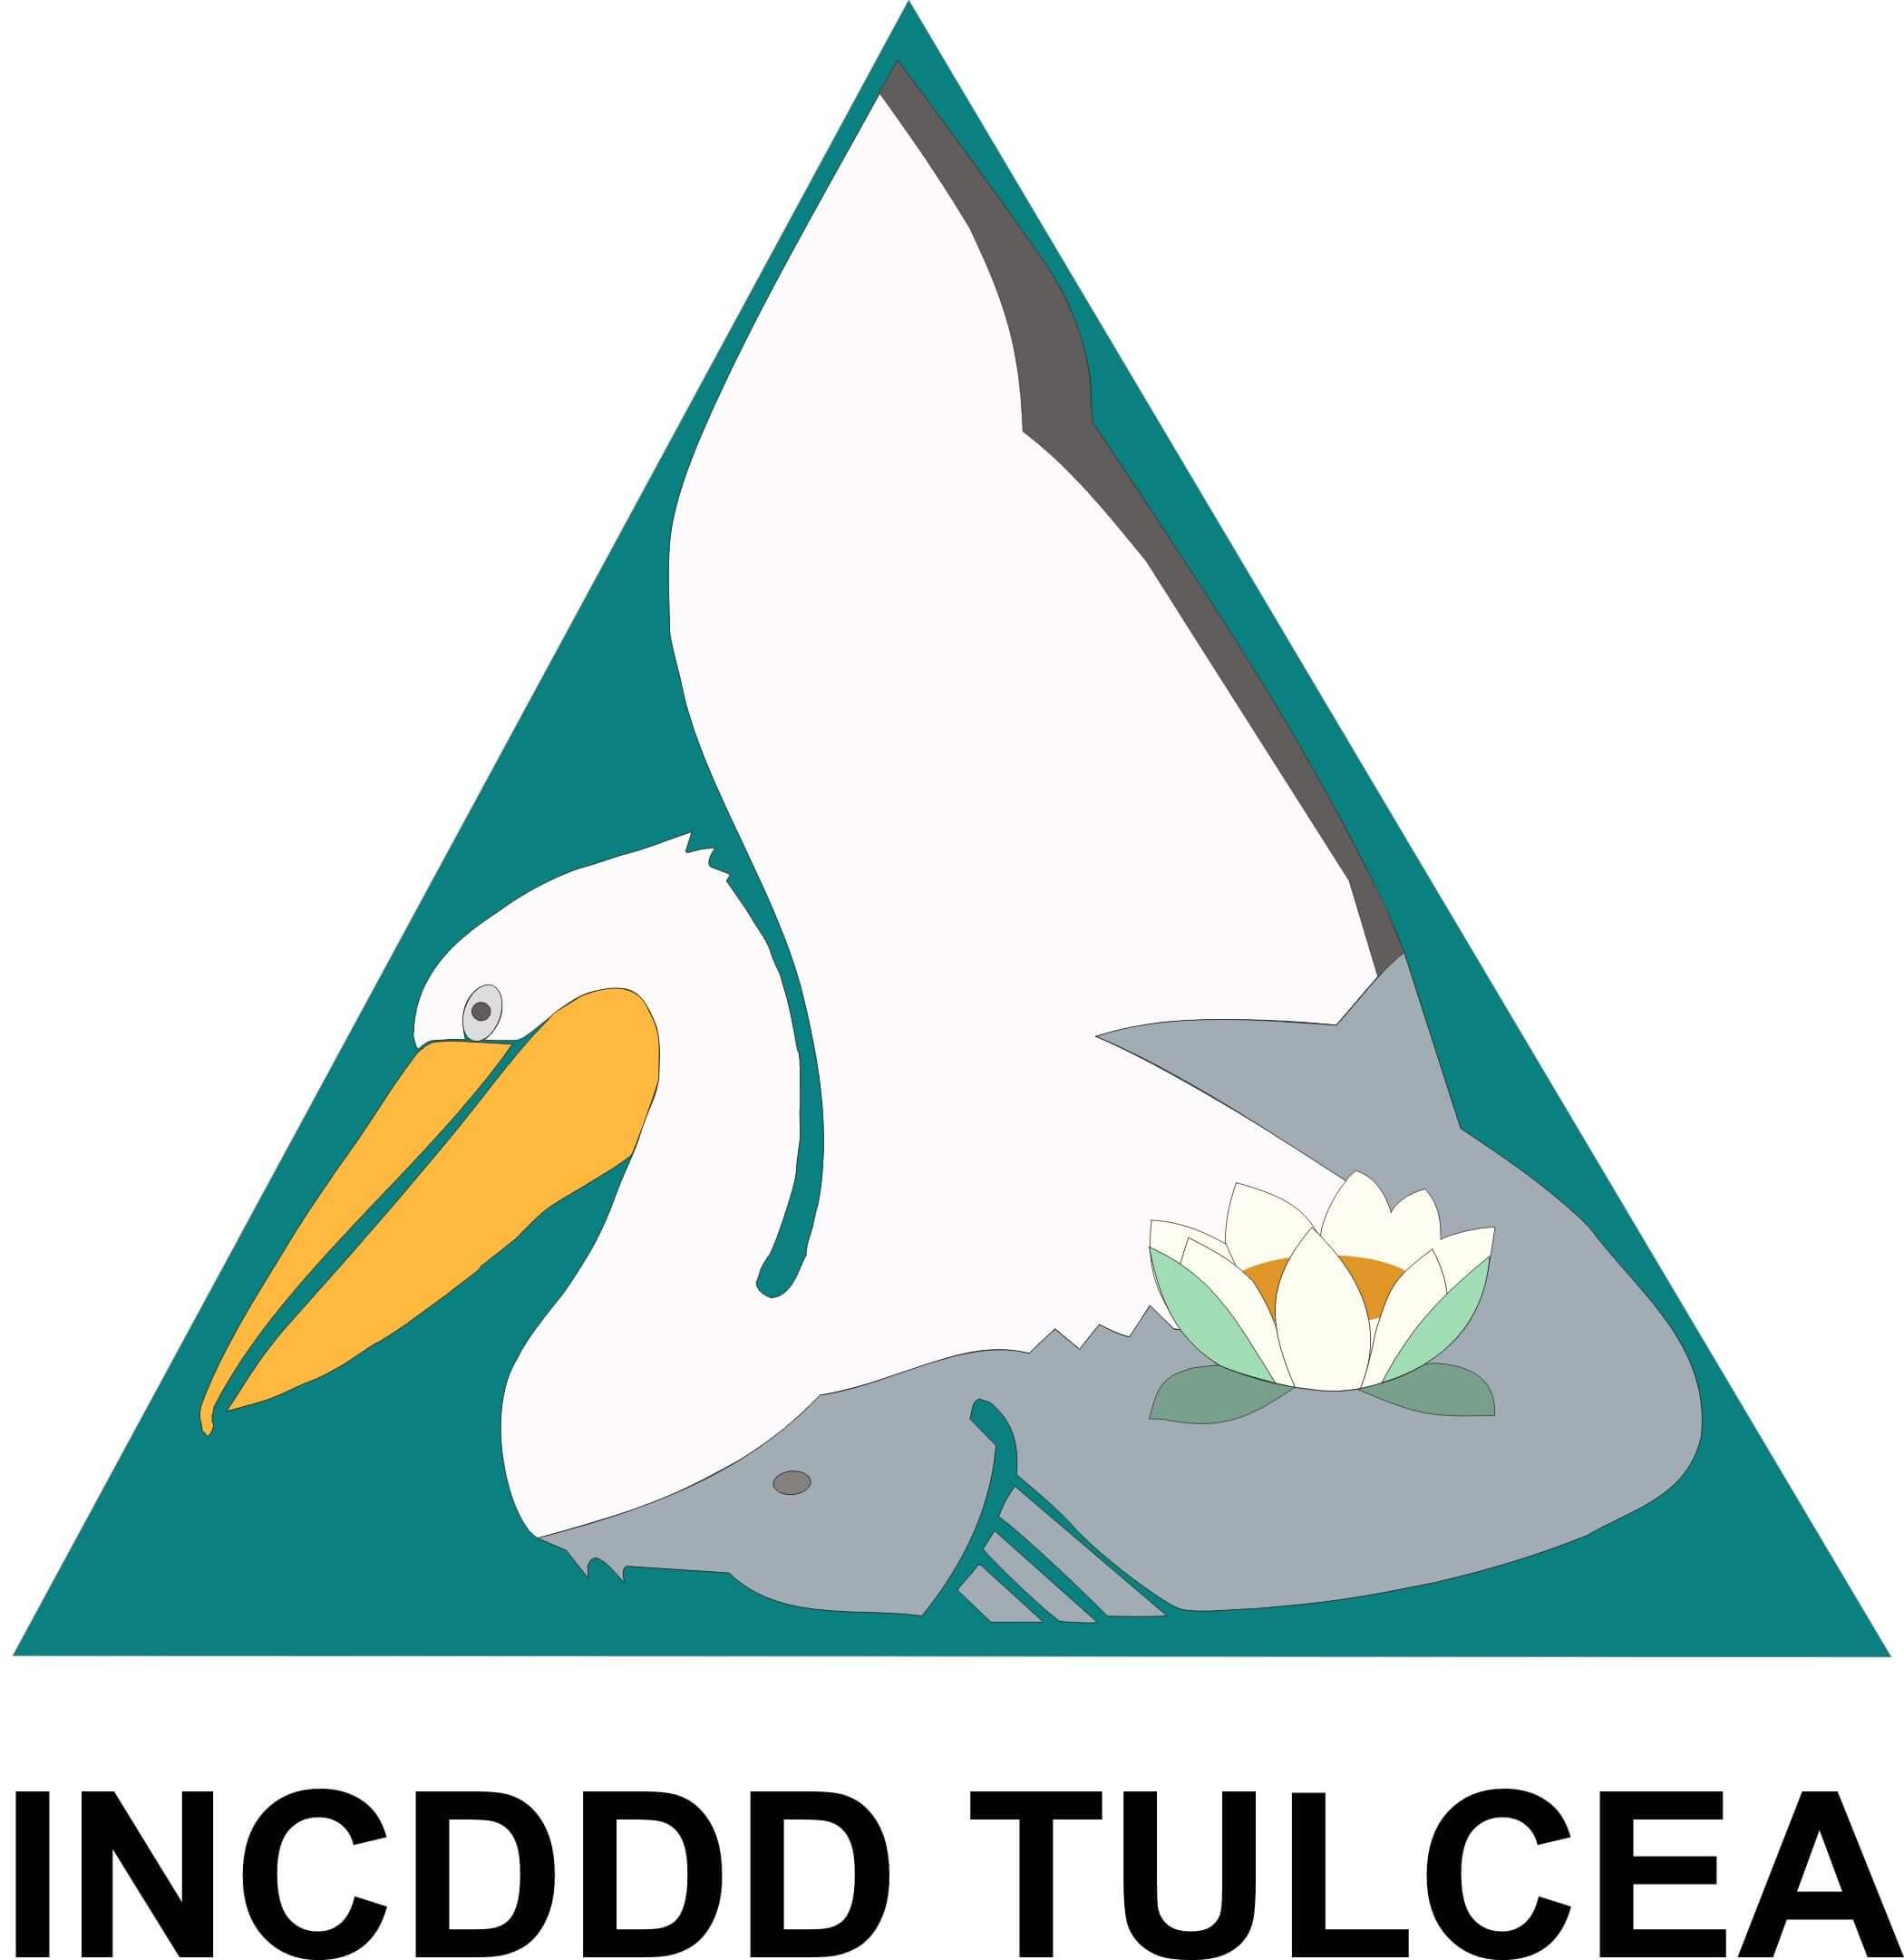 3.INCDDD Logo